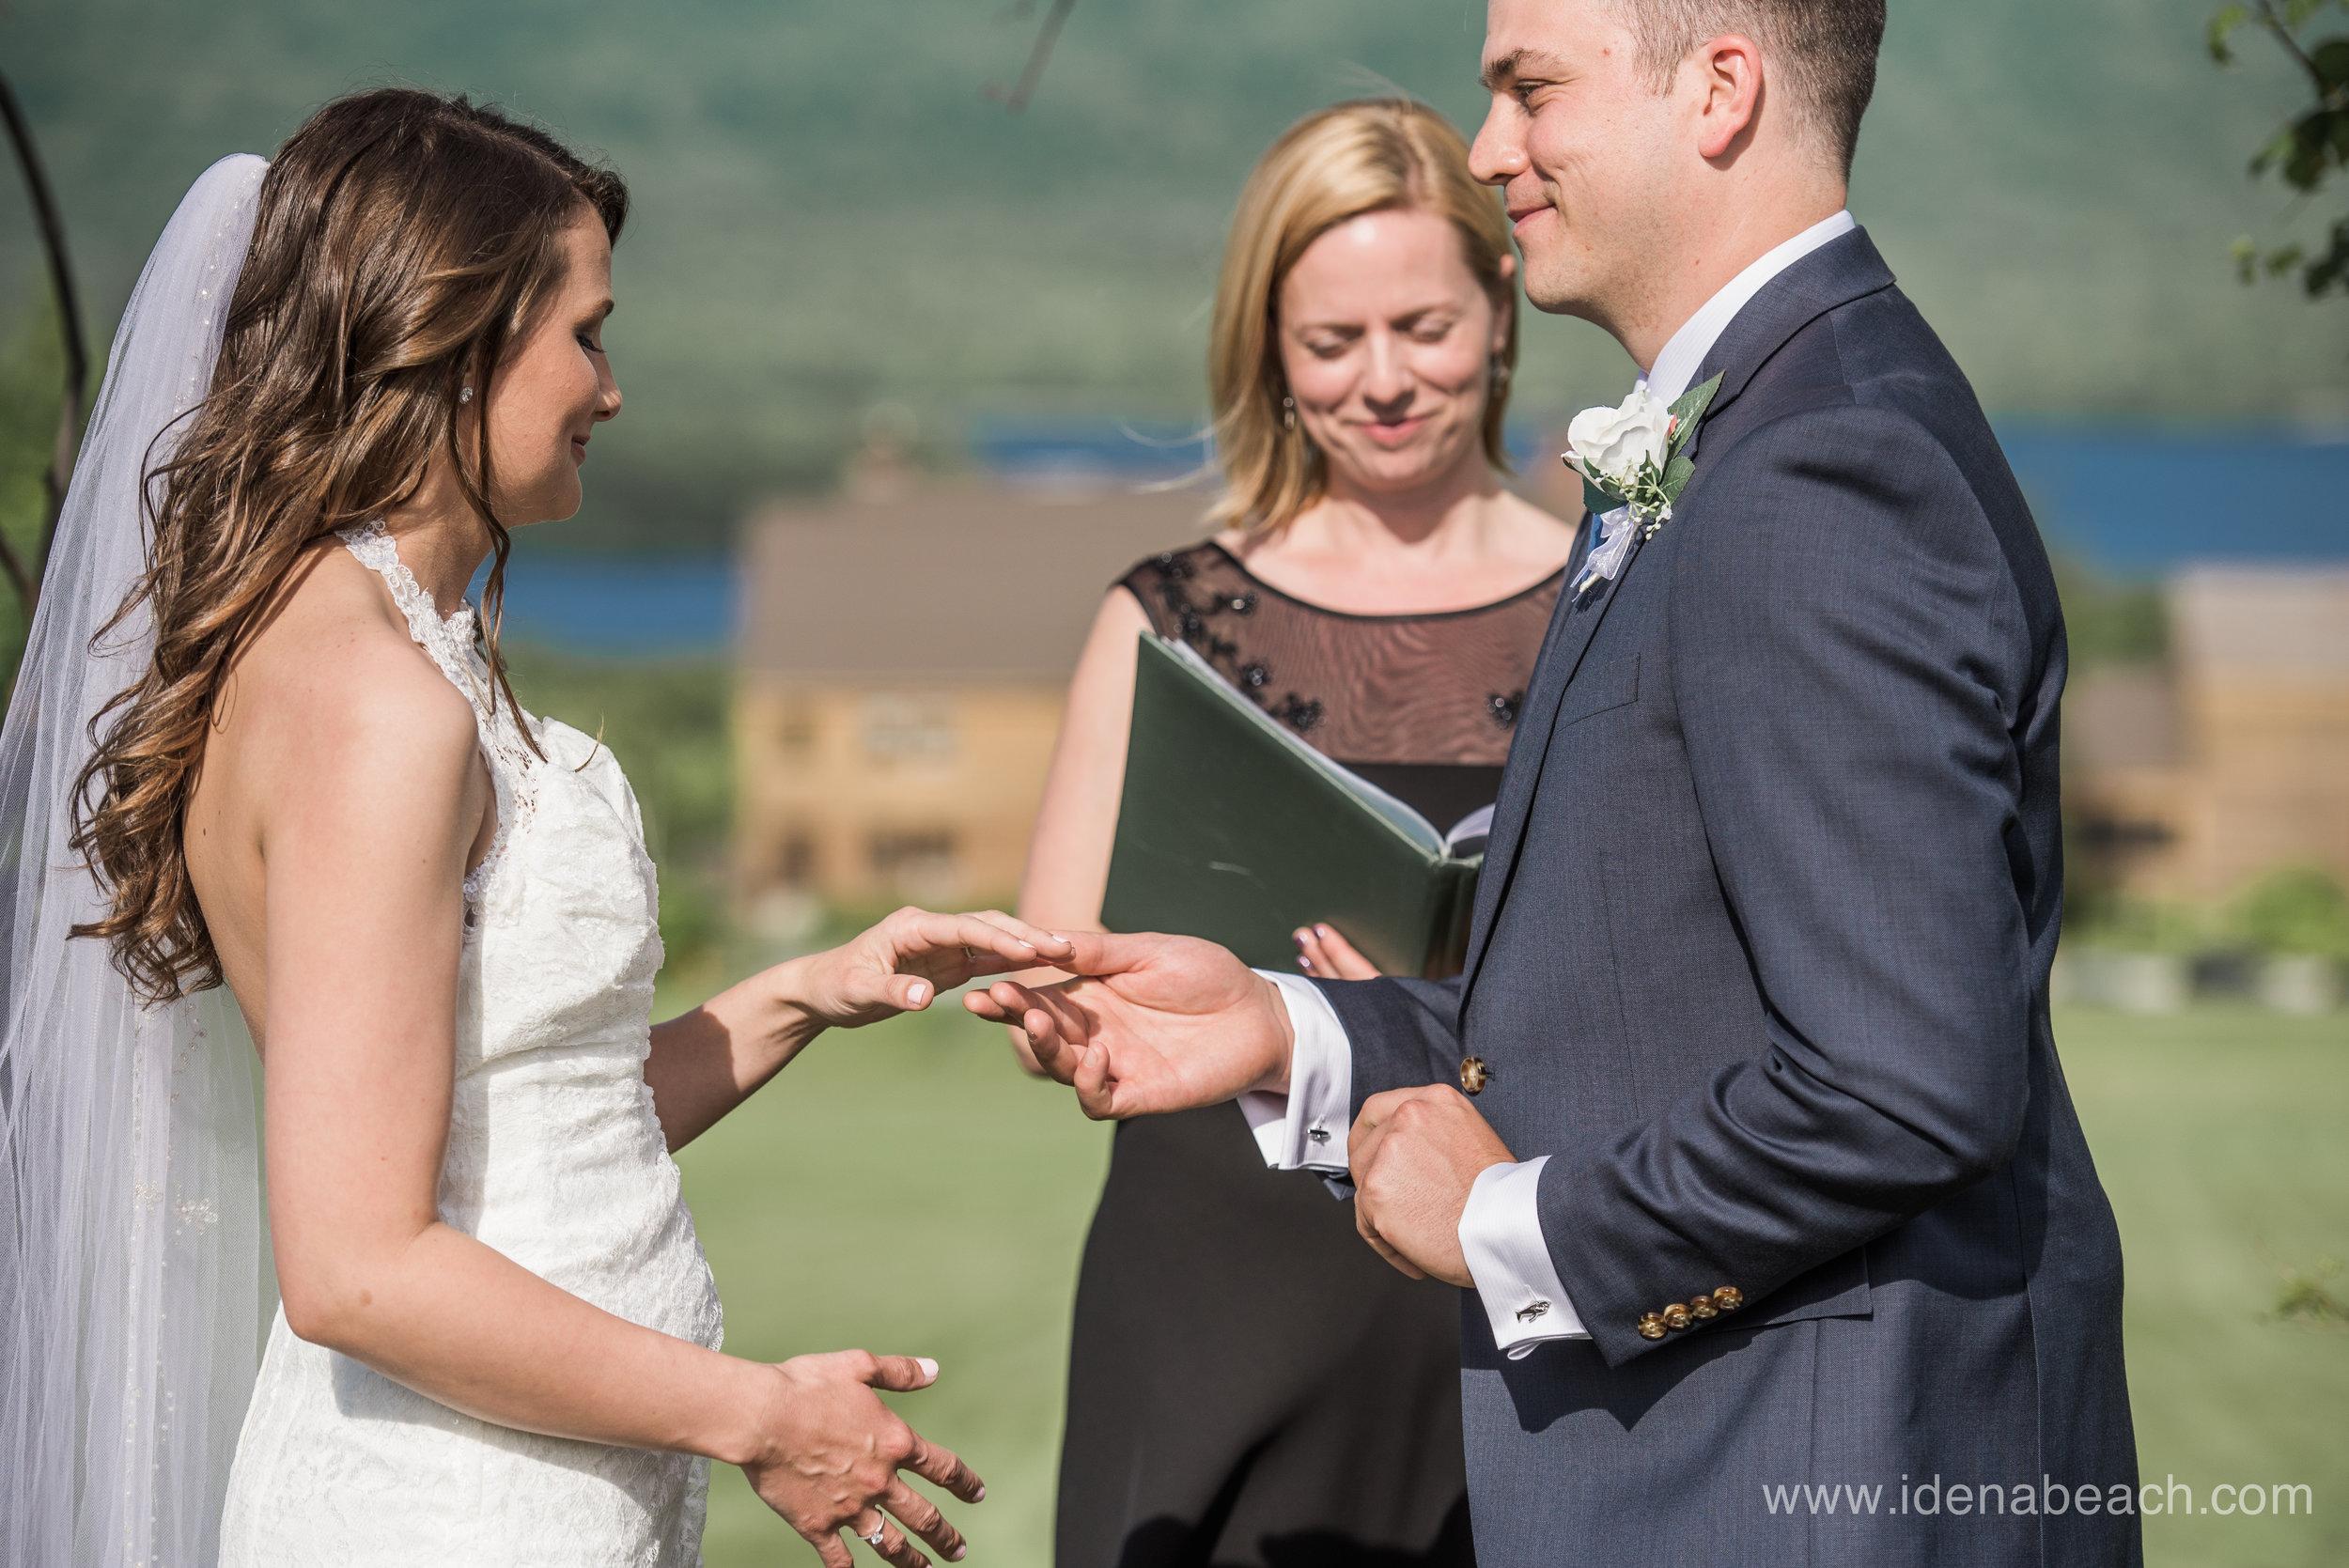 Mountain-Top-Inn-Vermont-Wedding-Photographer-58.jpg